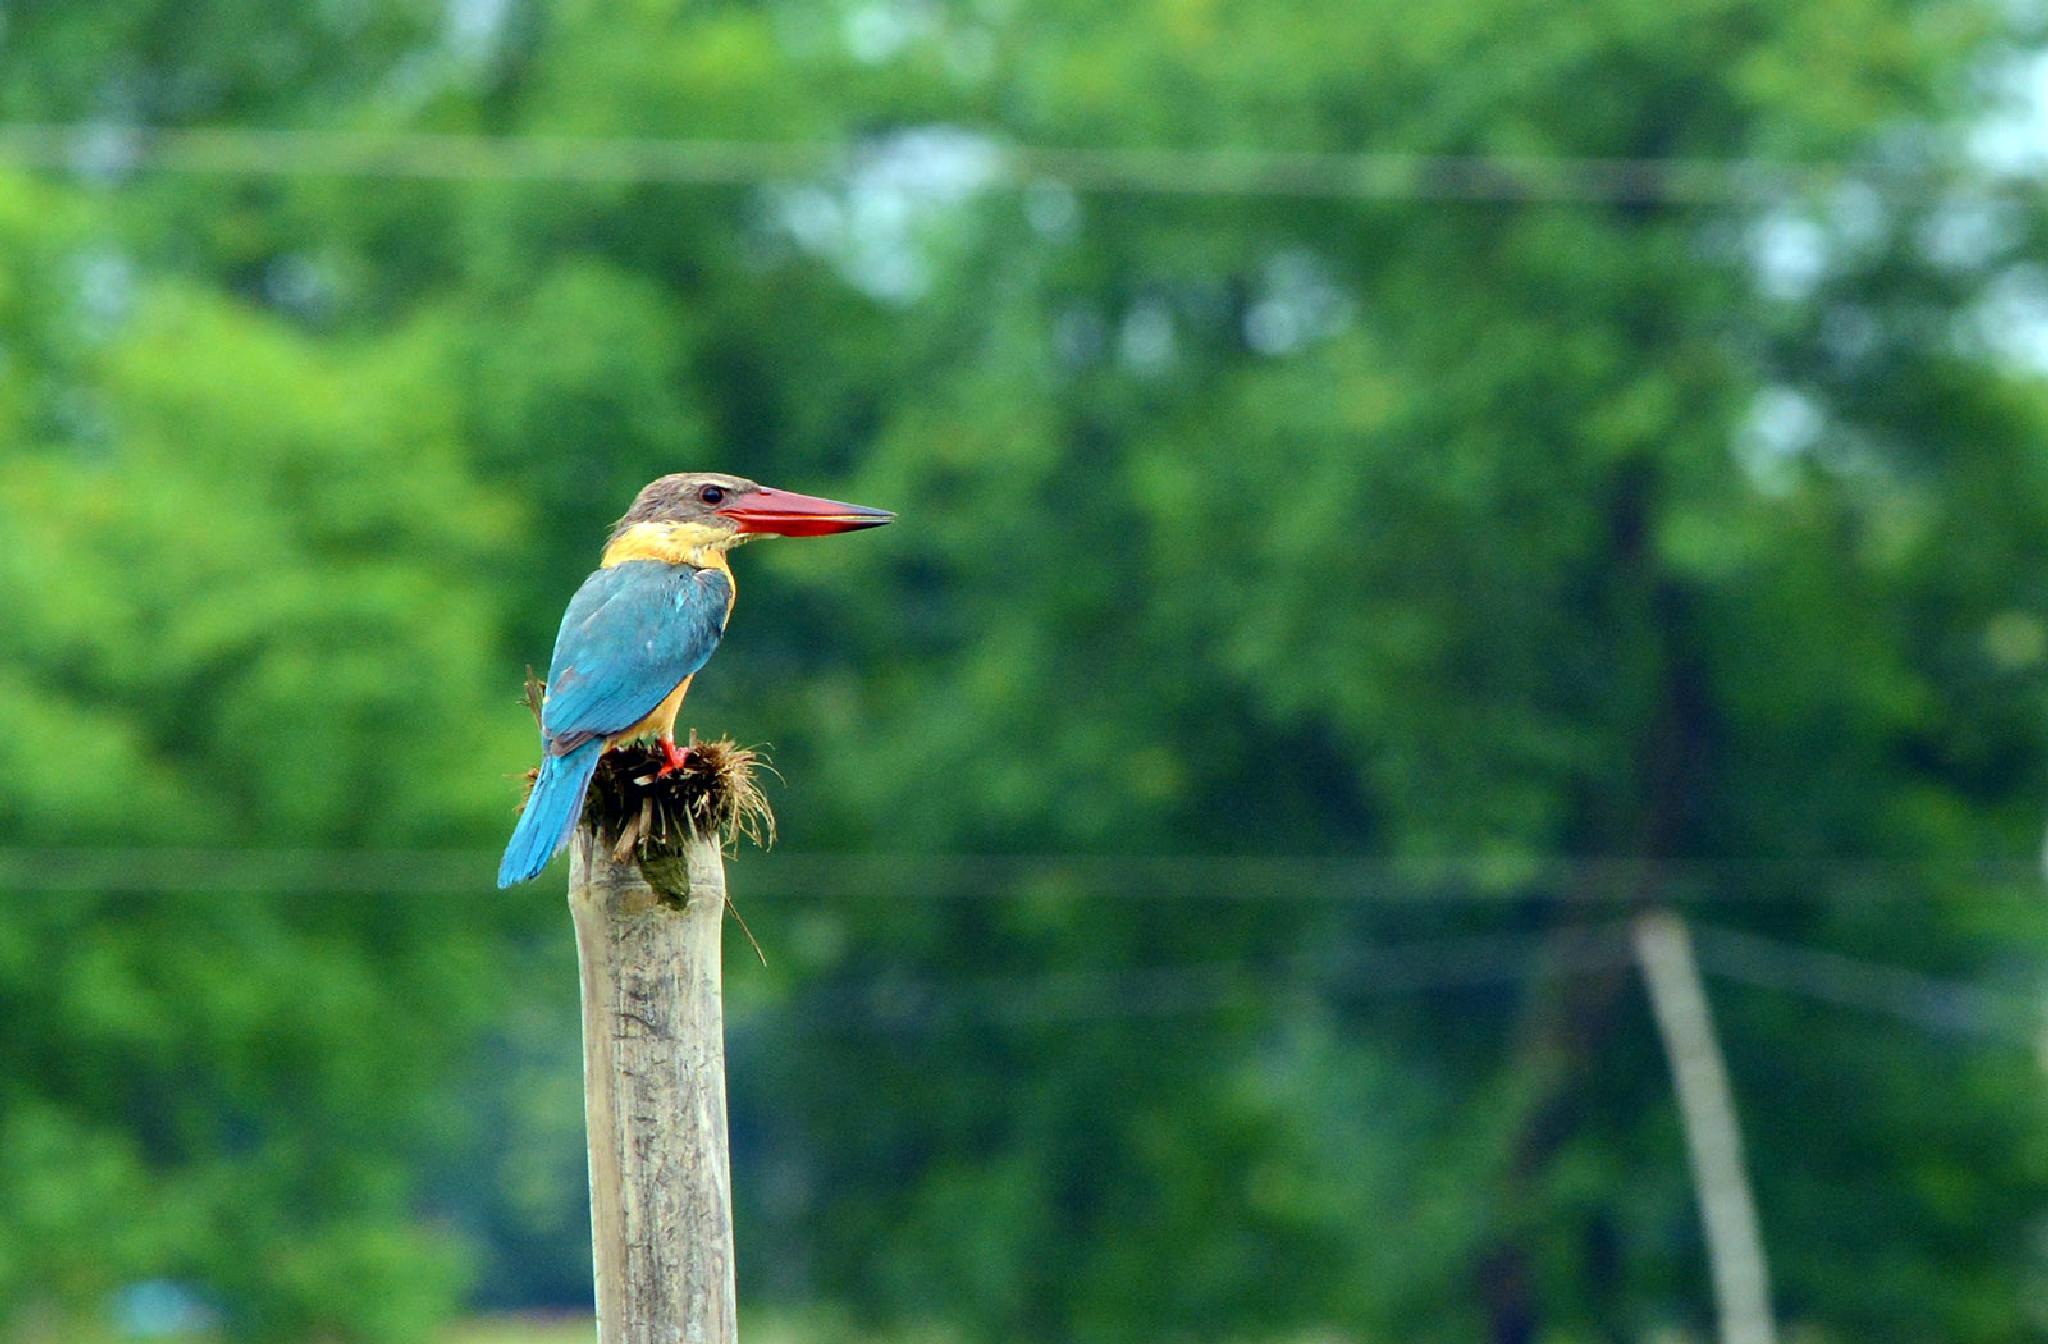 Stork-Billed Kingfisher by Maroof Rana